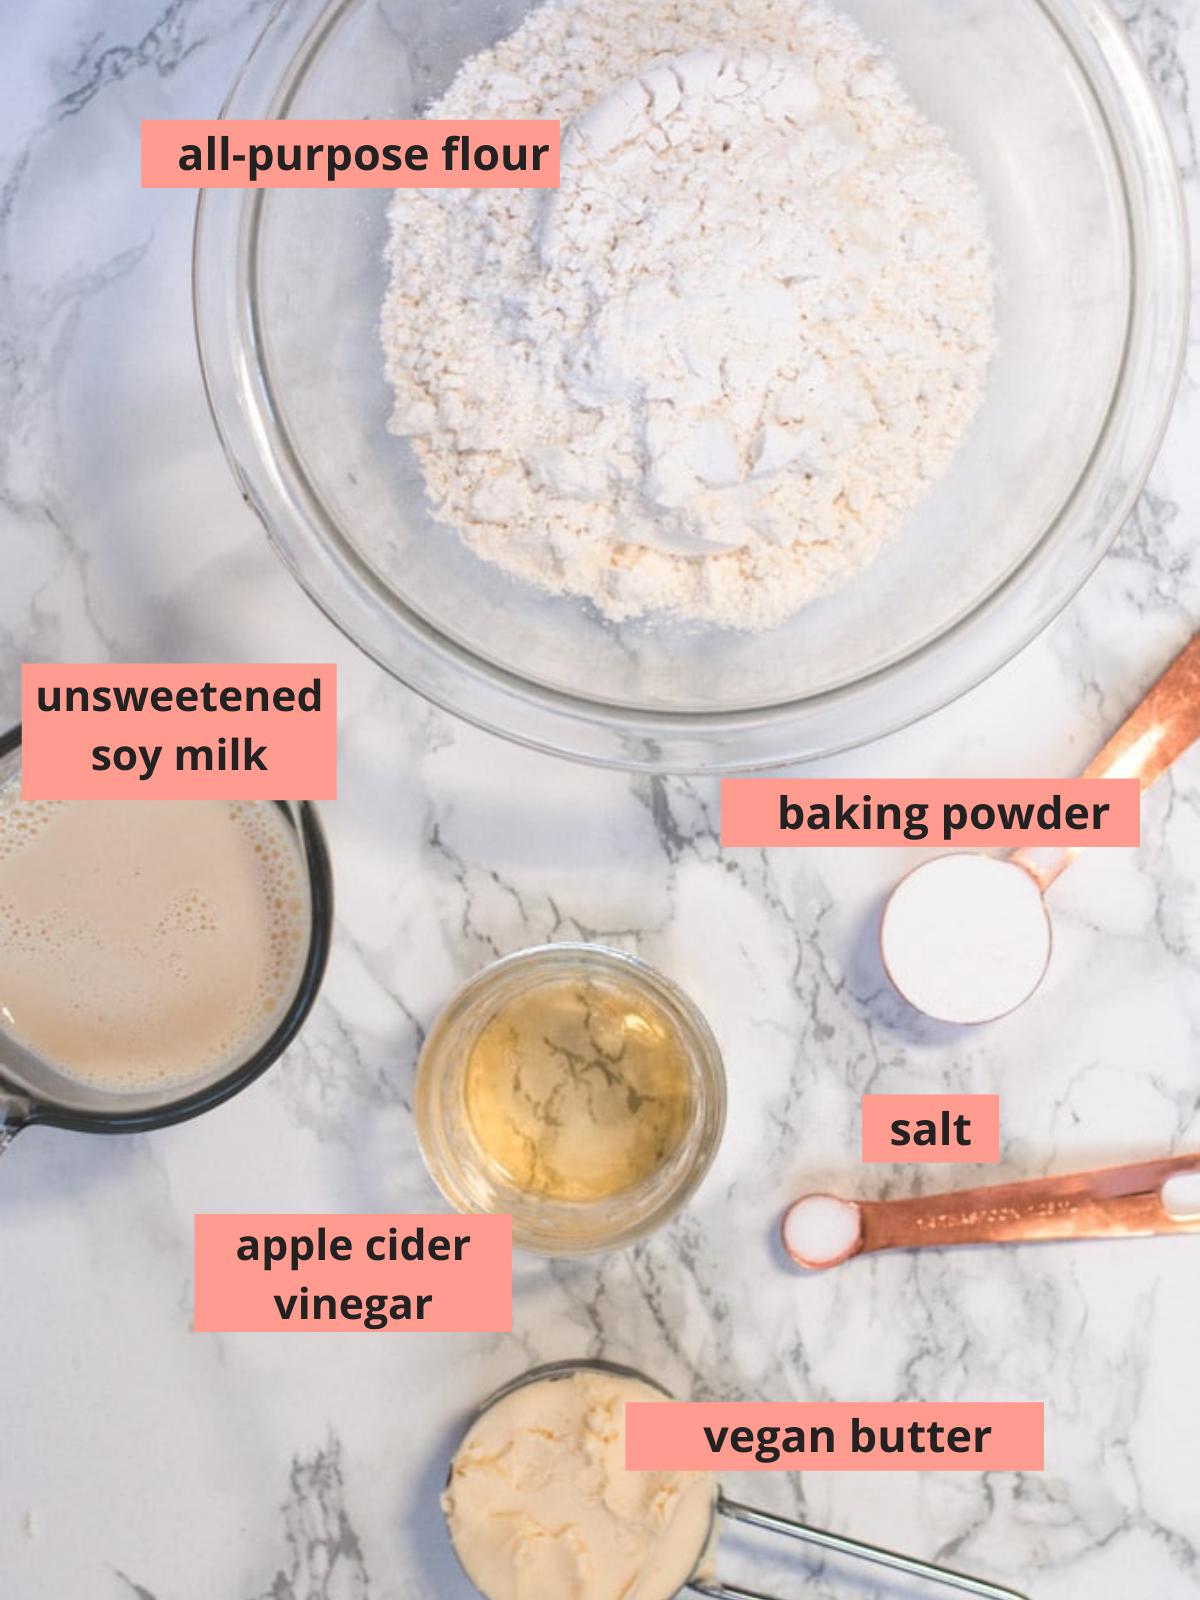 Labeled ingredients used to make vegan biscuits